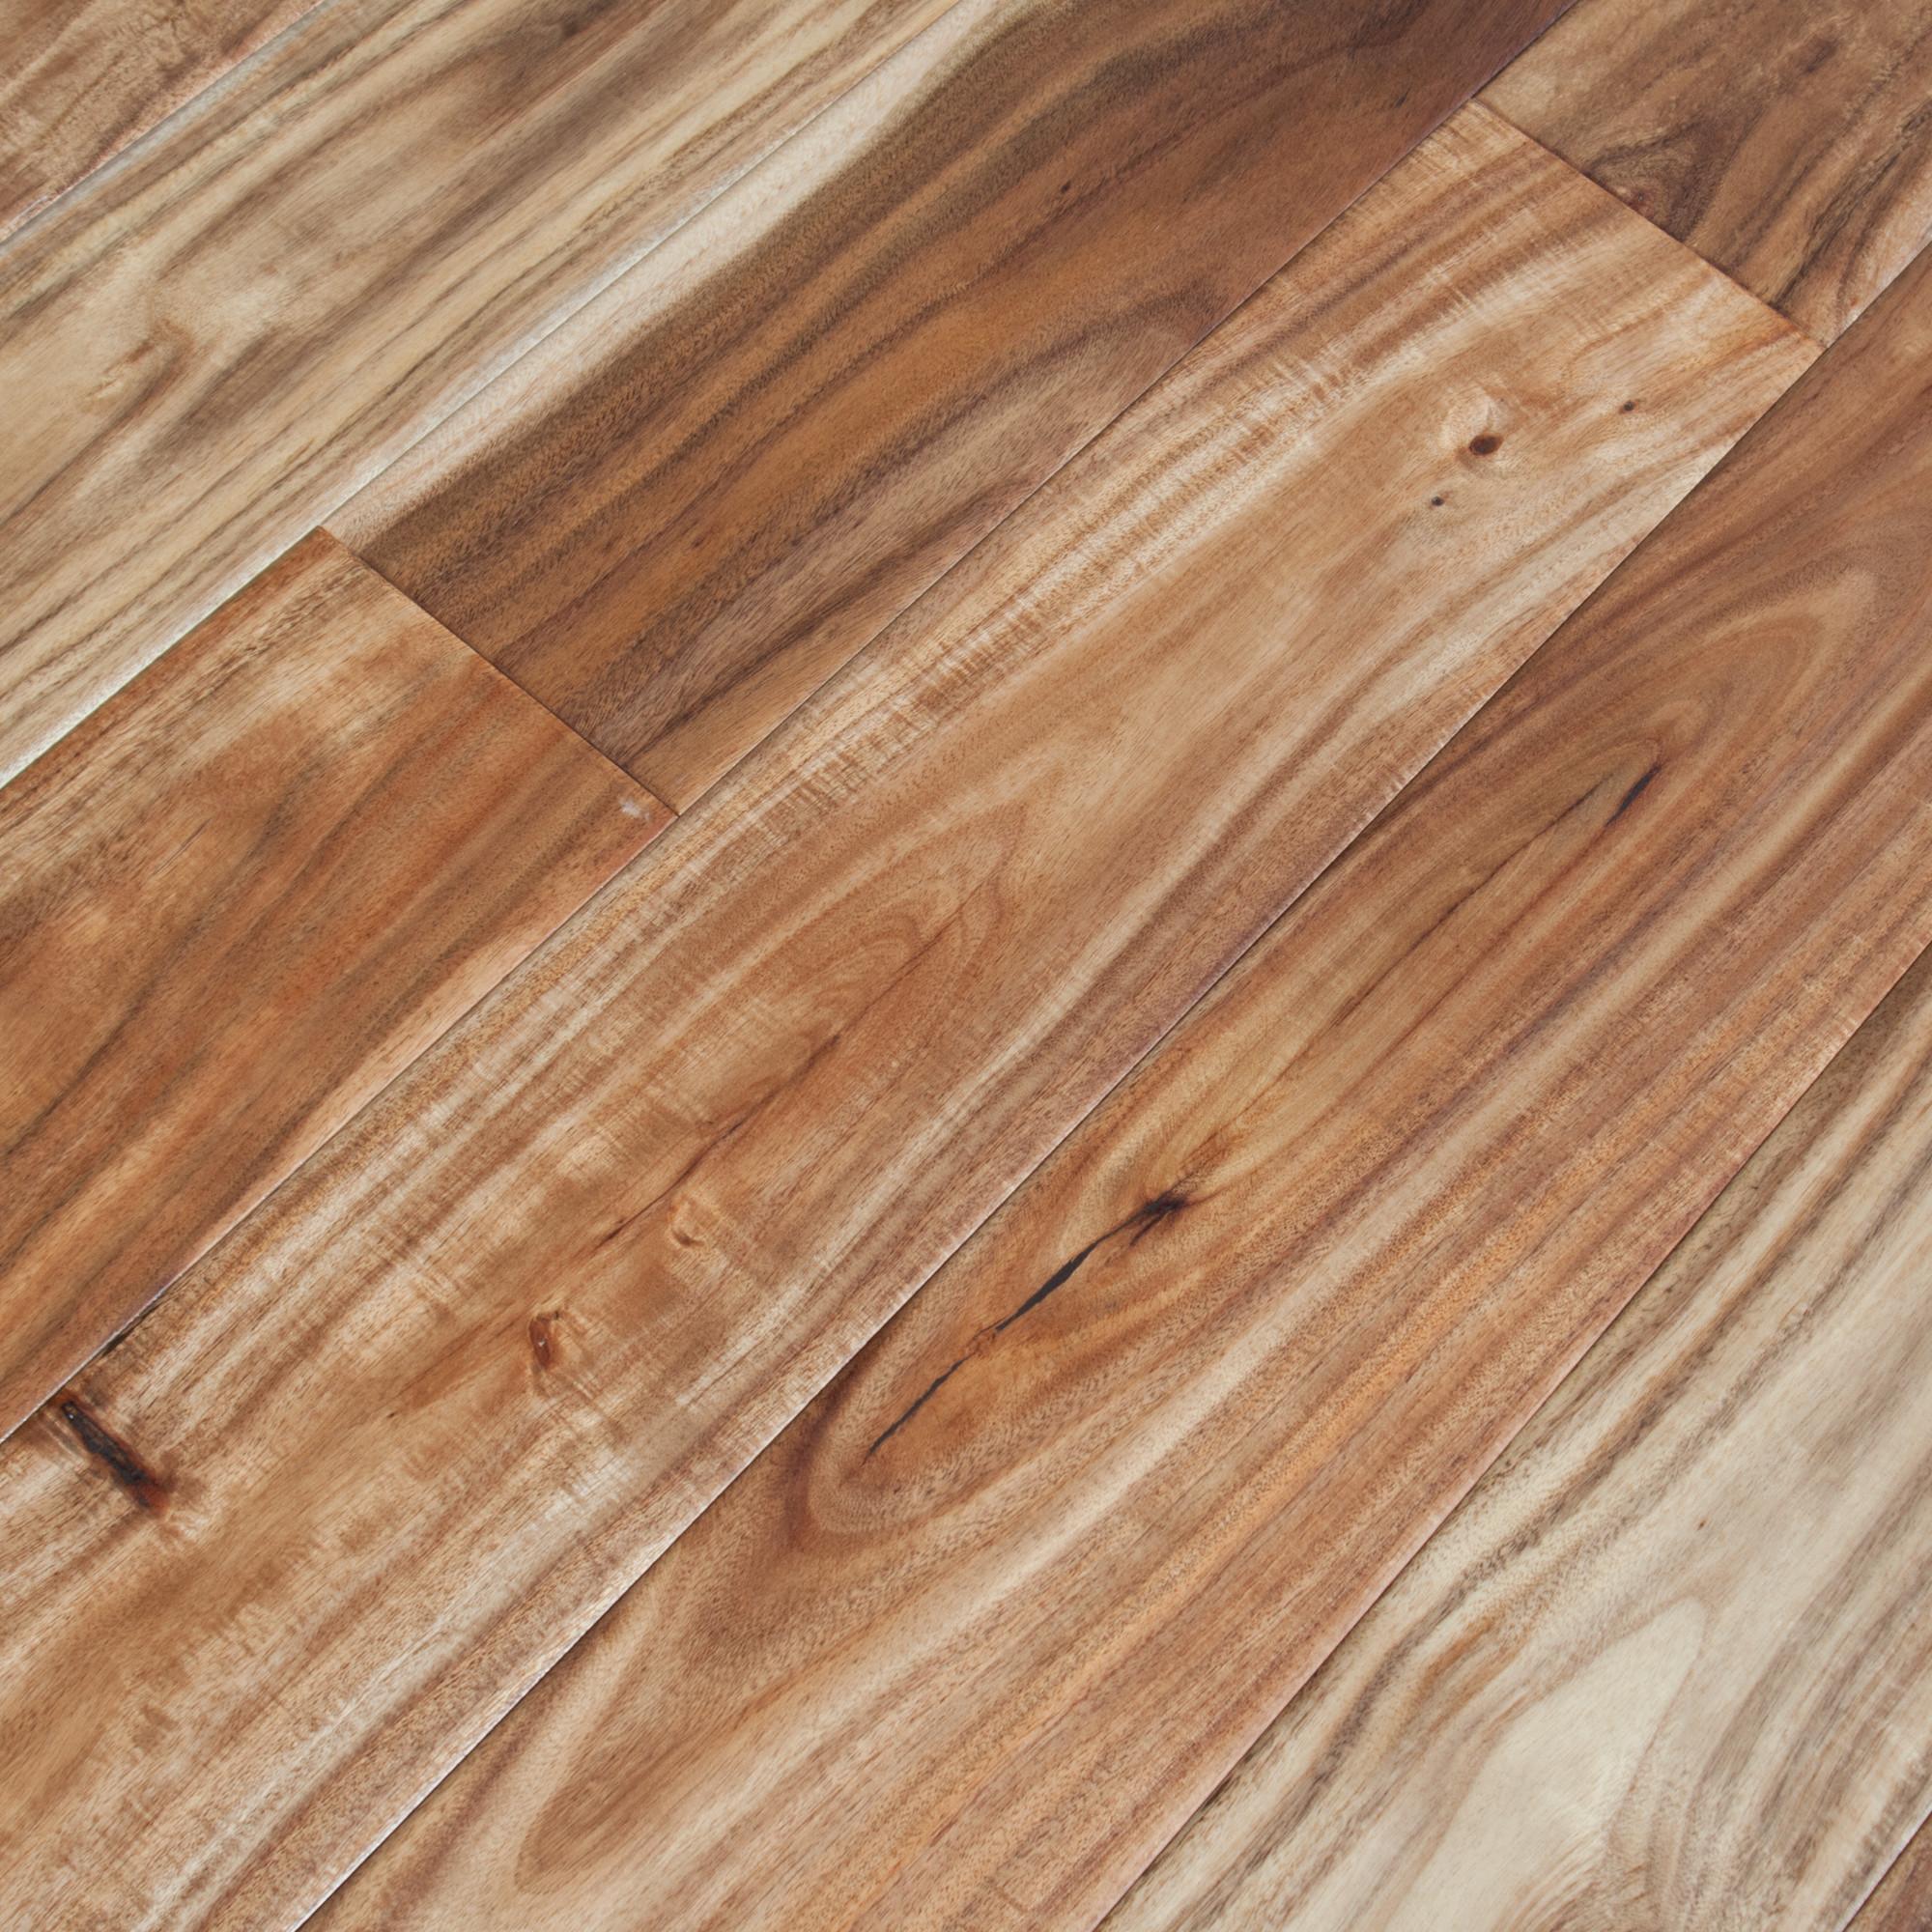 hardwood floor underlayment types of 9 mile creek acacia hand scraped acacia confusa wood floors with regard to acacia handscraped natural hardwood flooring